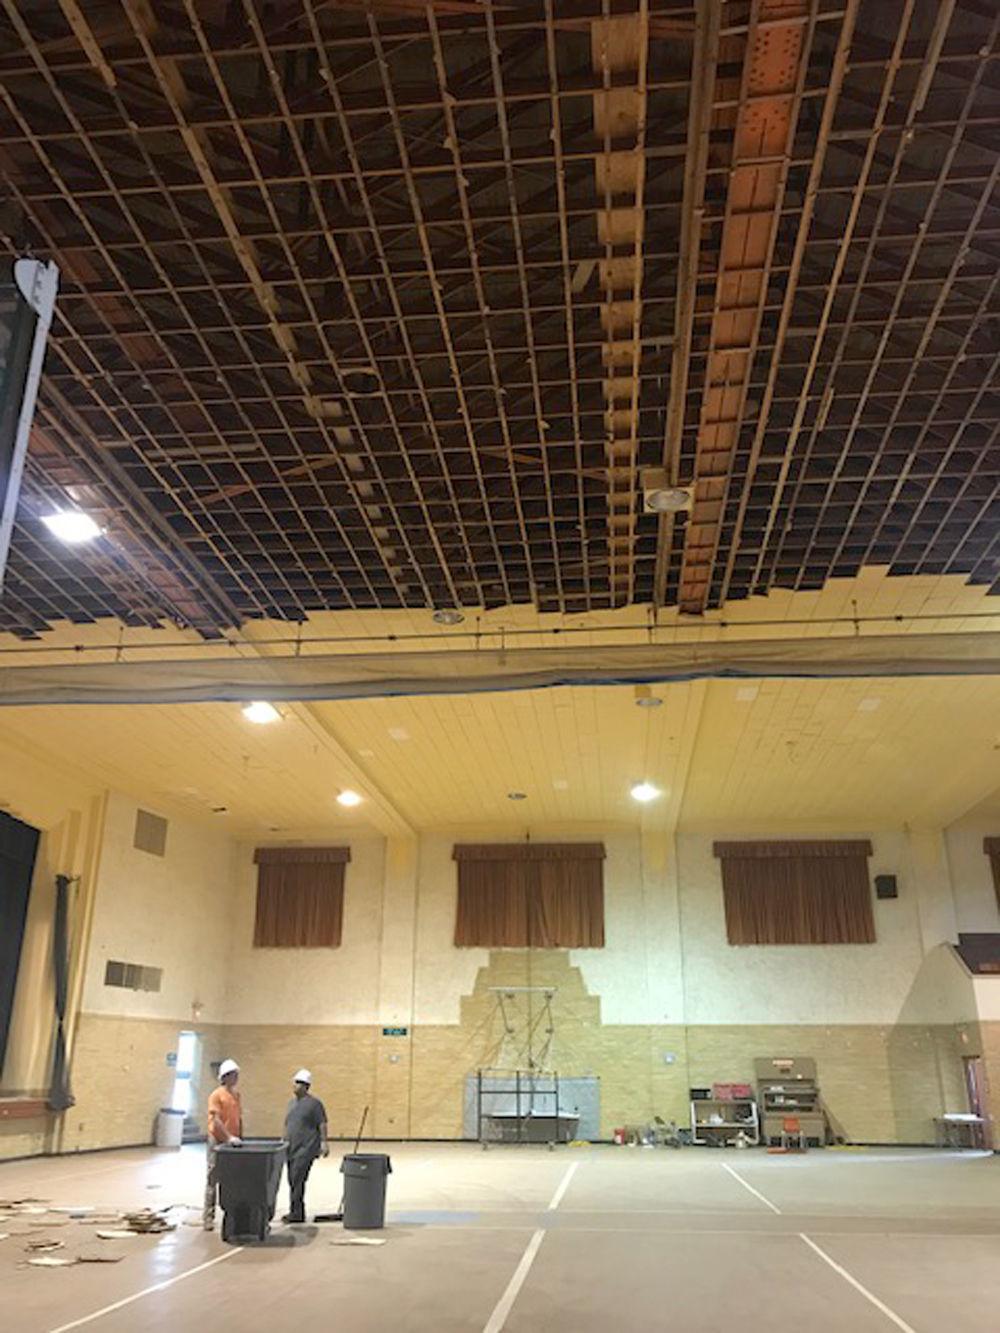 Gym at Fremont City Auditorium